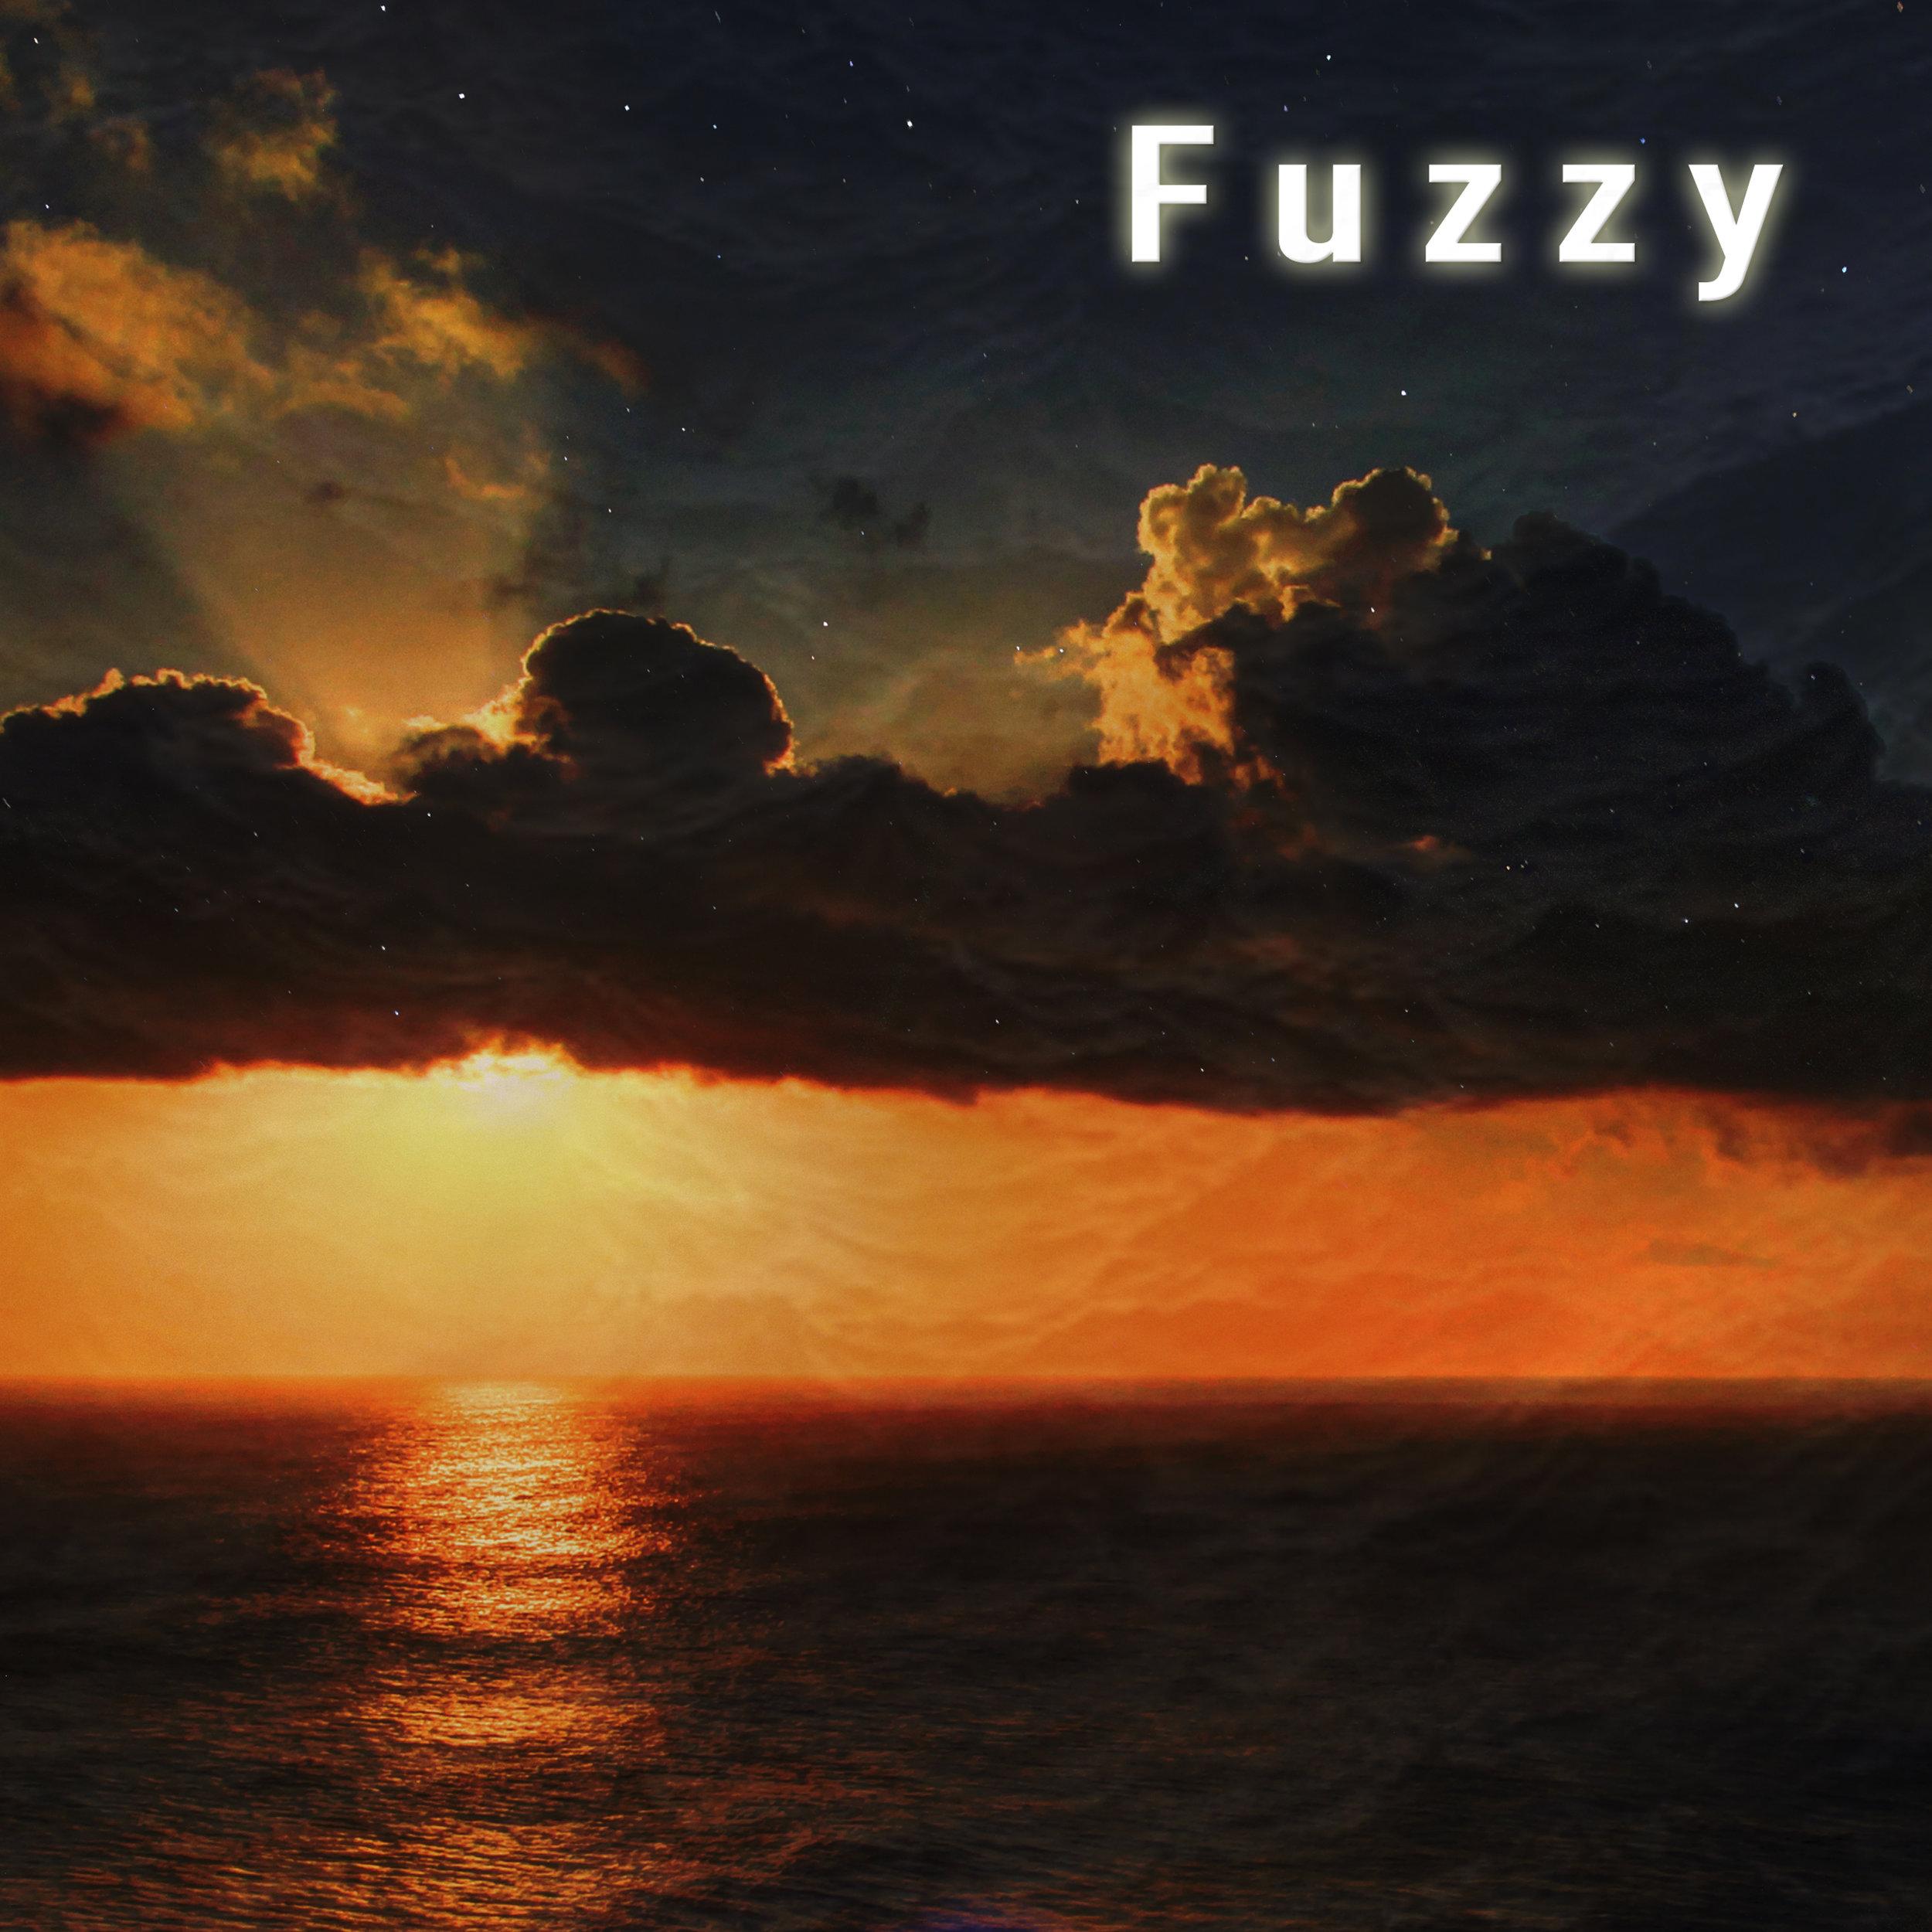 Fuzzy - Modulate Artwork.jpg